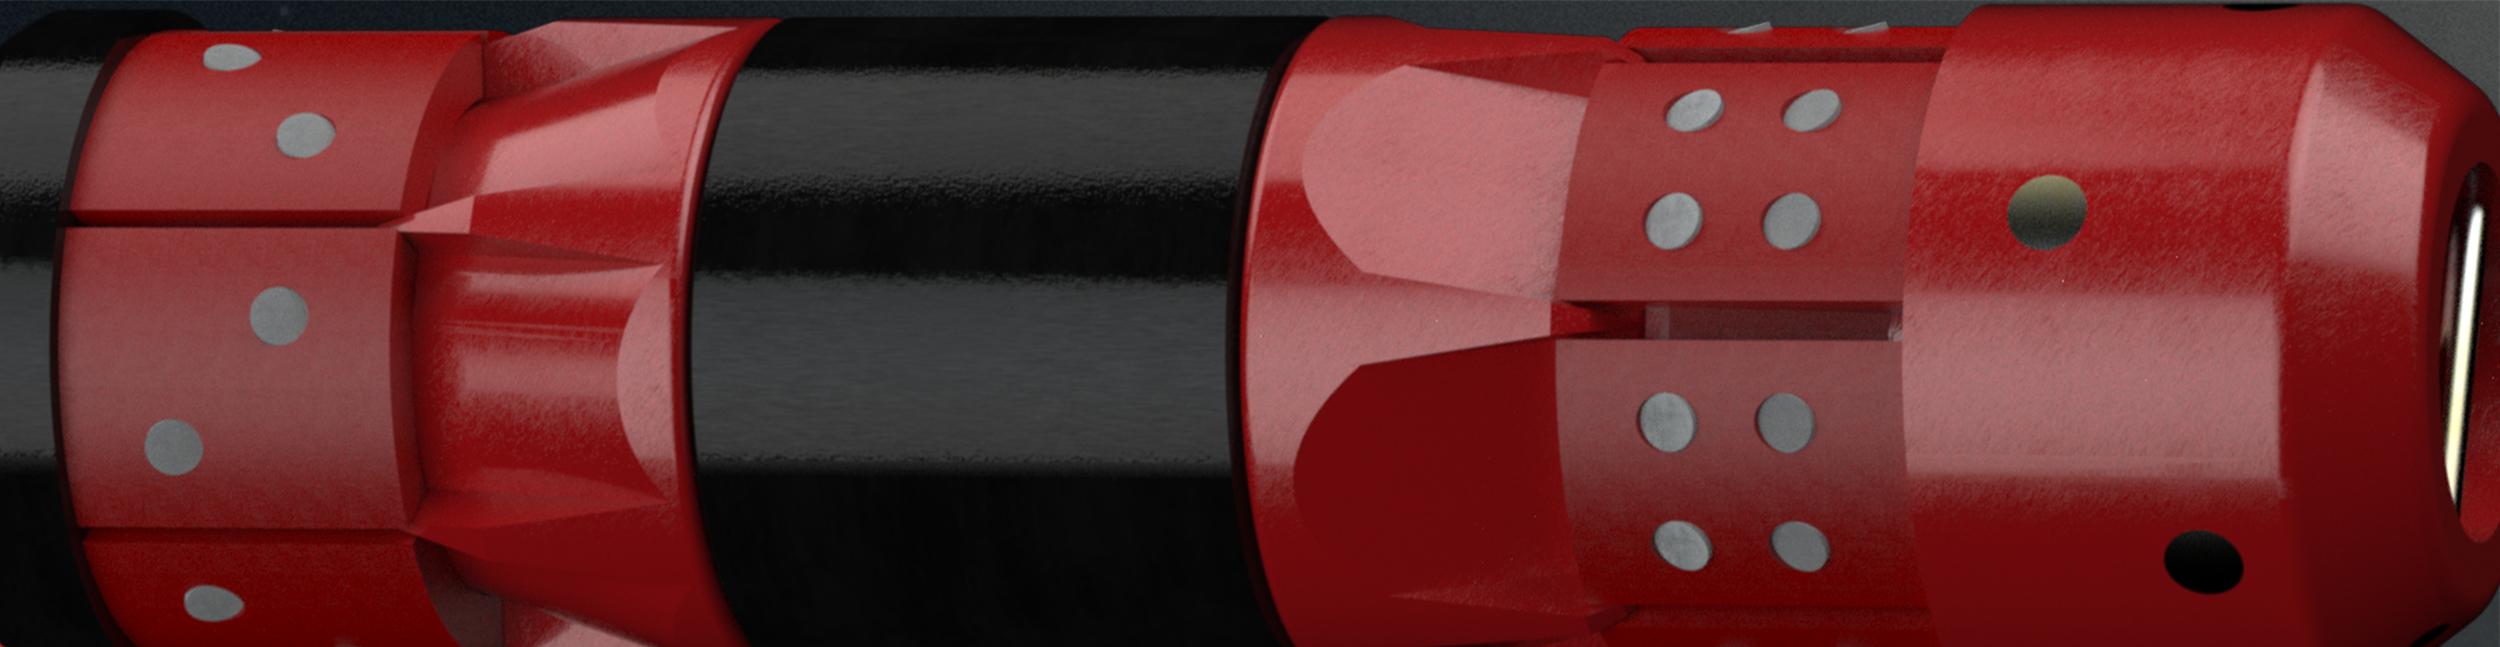 Halliburton Fas Drill® Ultra Frac Plug